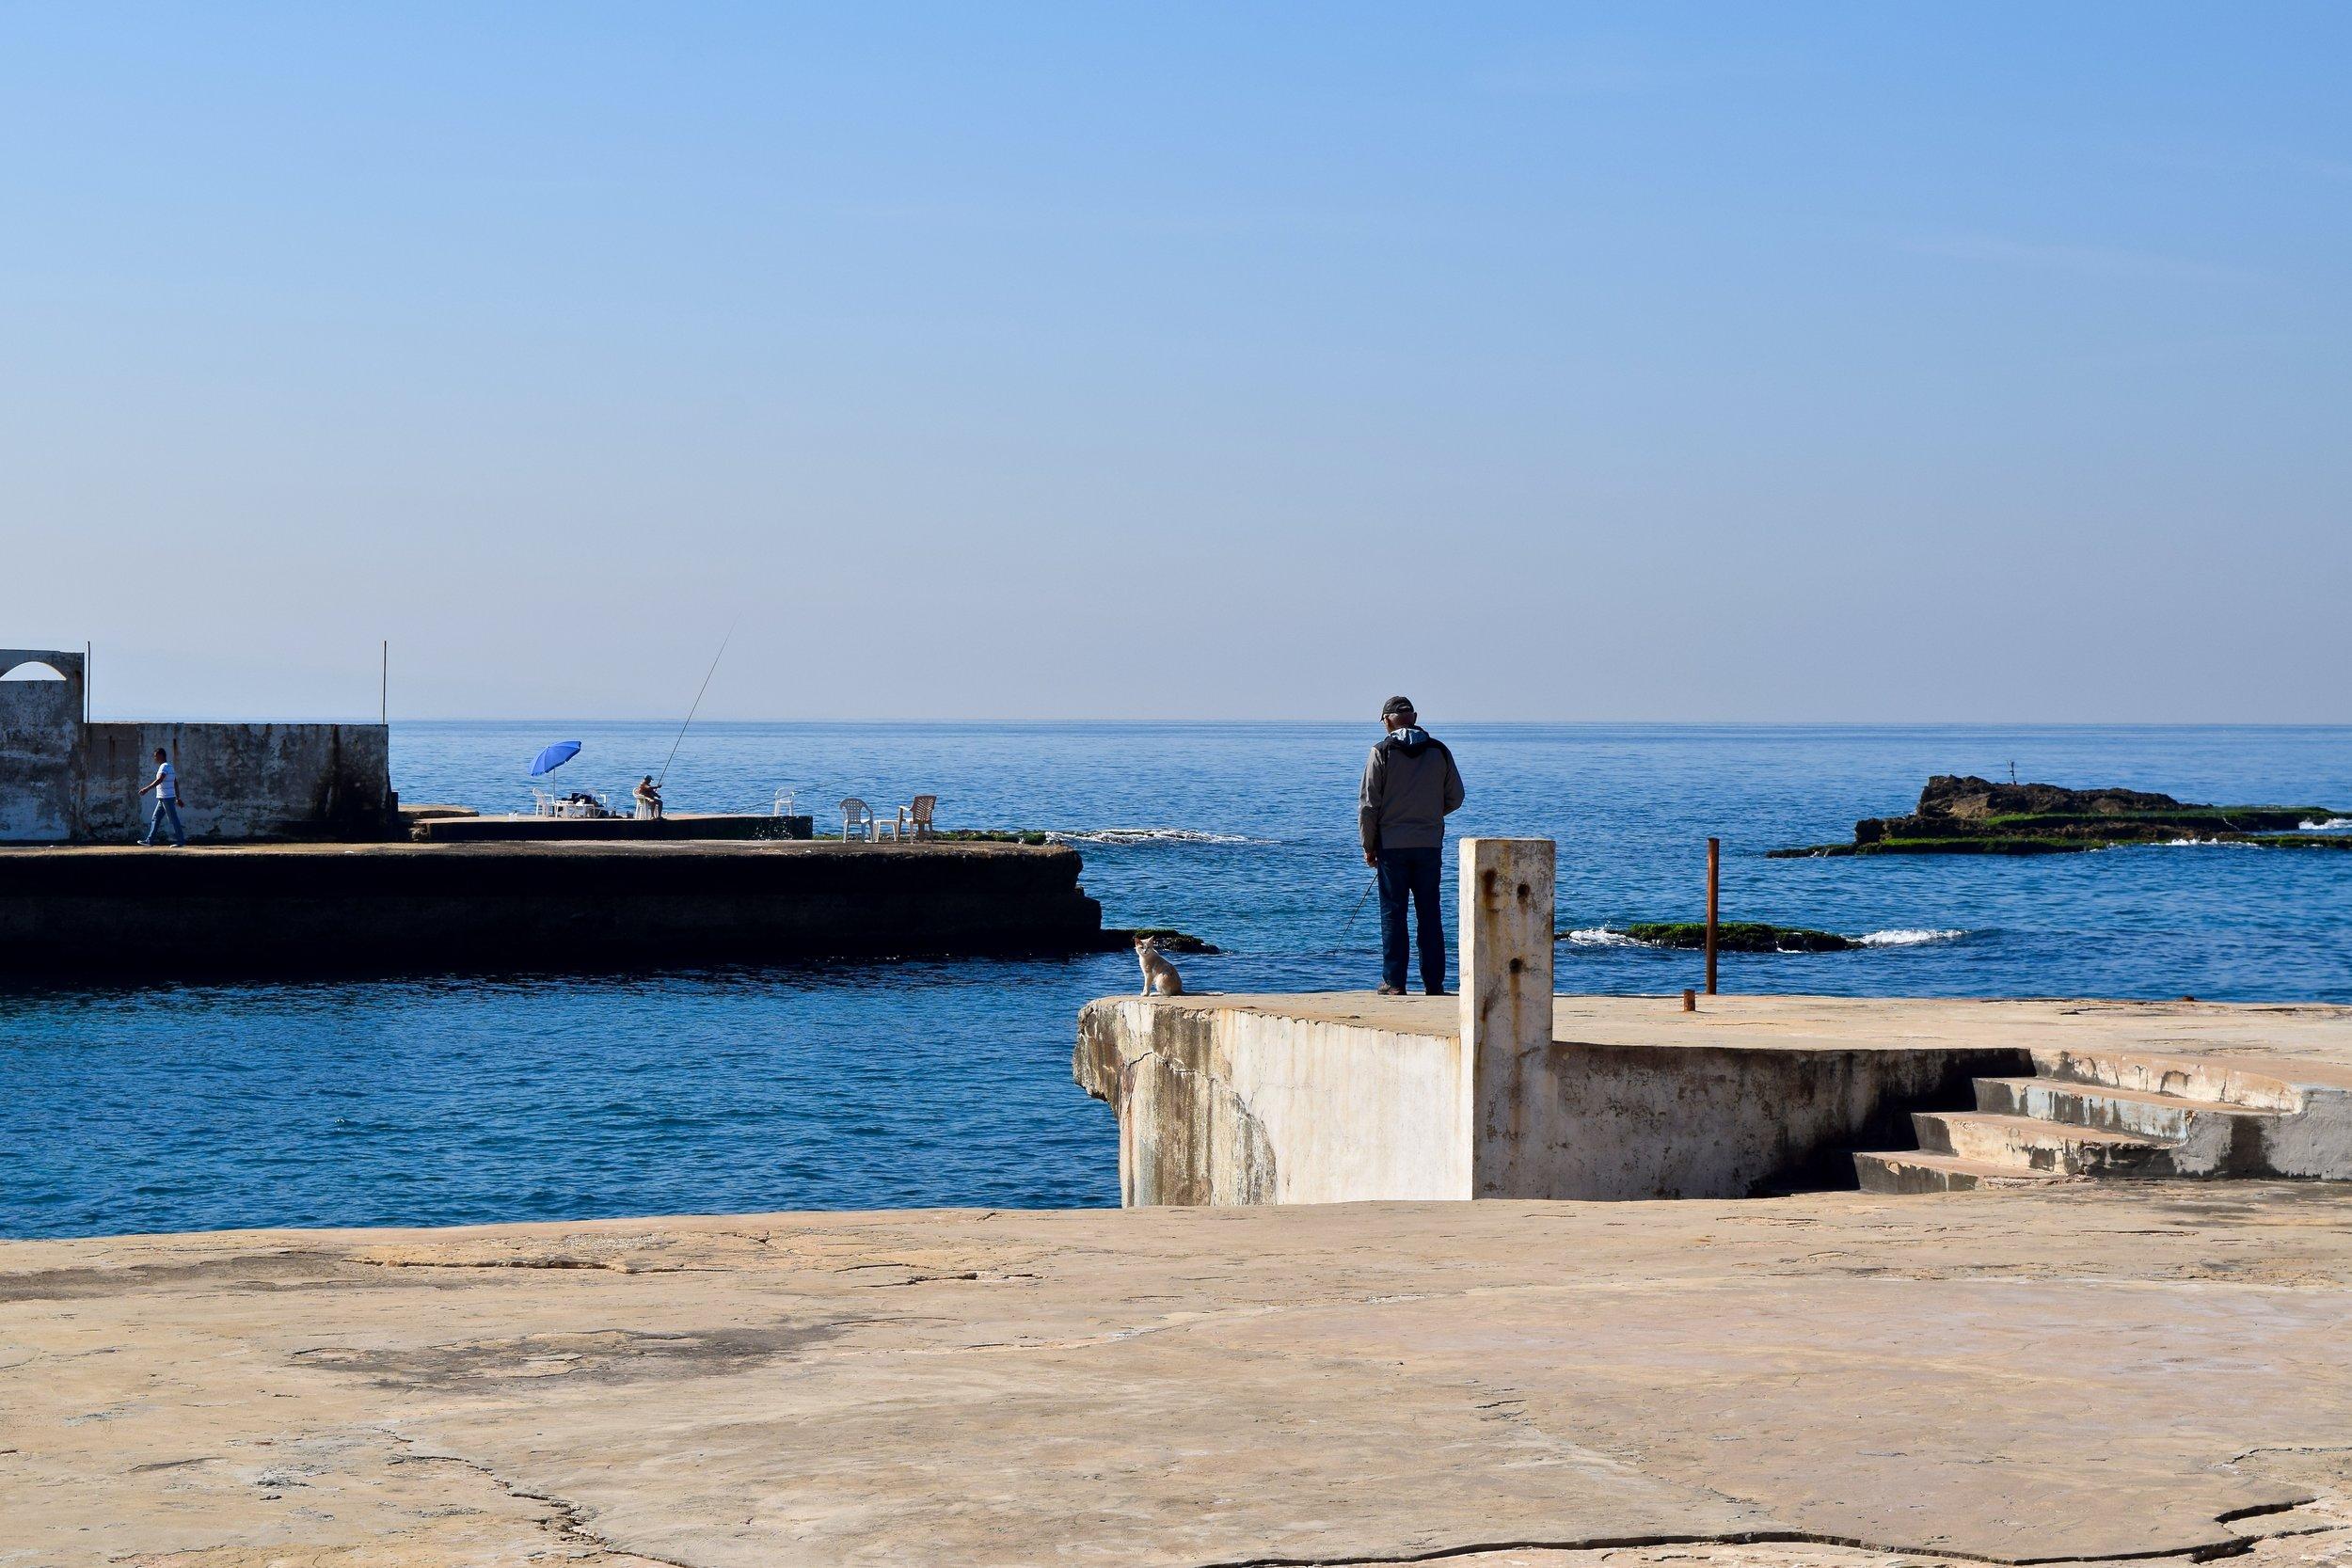 Local man fishing